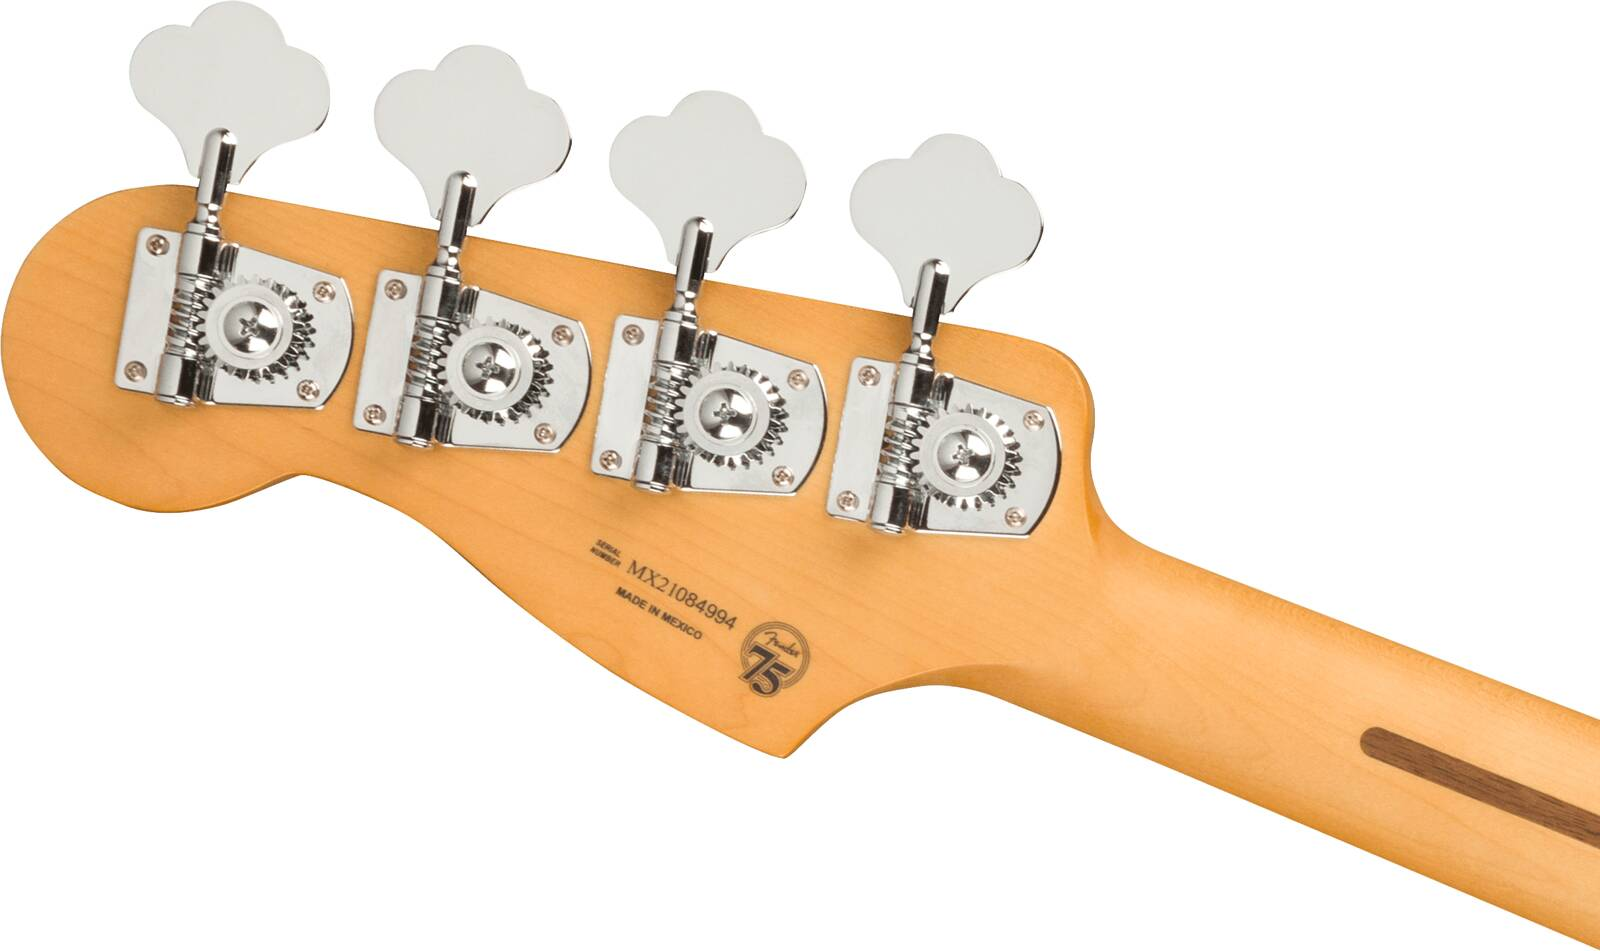 Fender Player Plus Precision Bass Pau Ferro Fingerboard, 3-Color Sunburst : photo 5